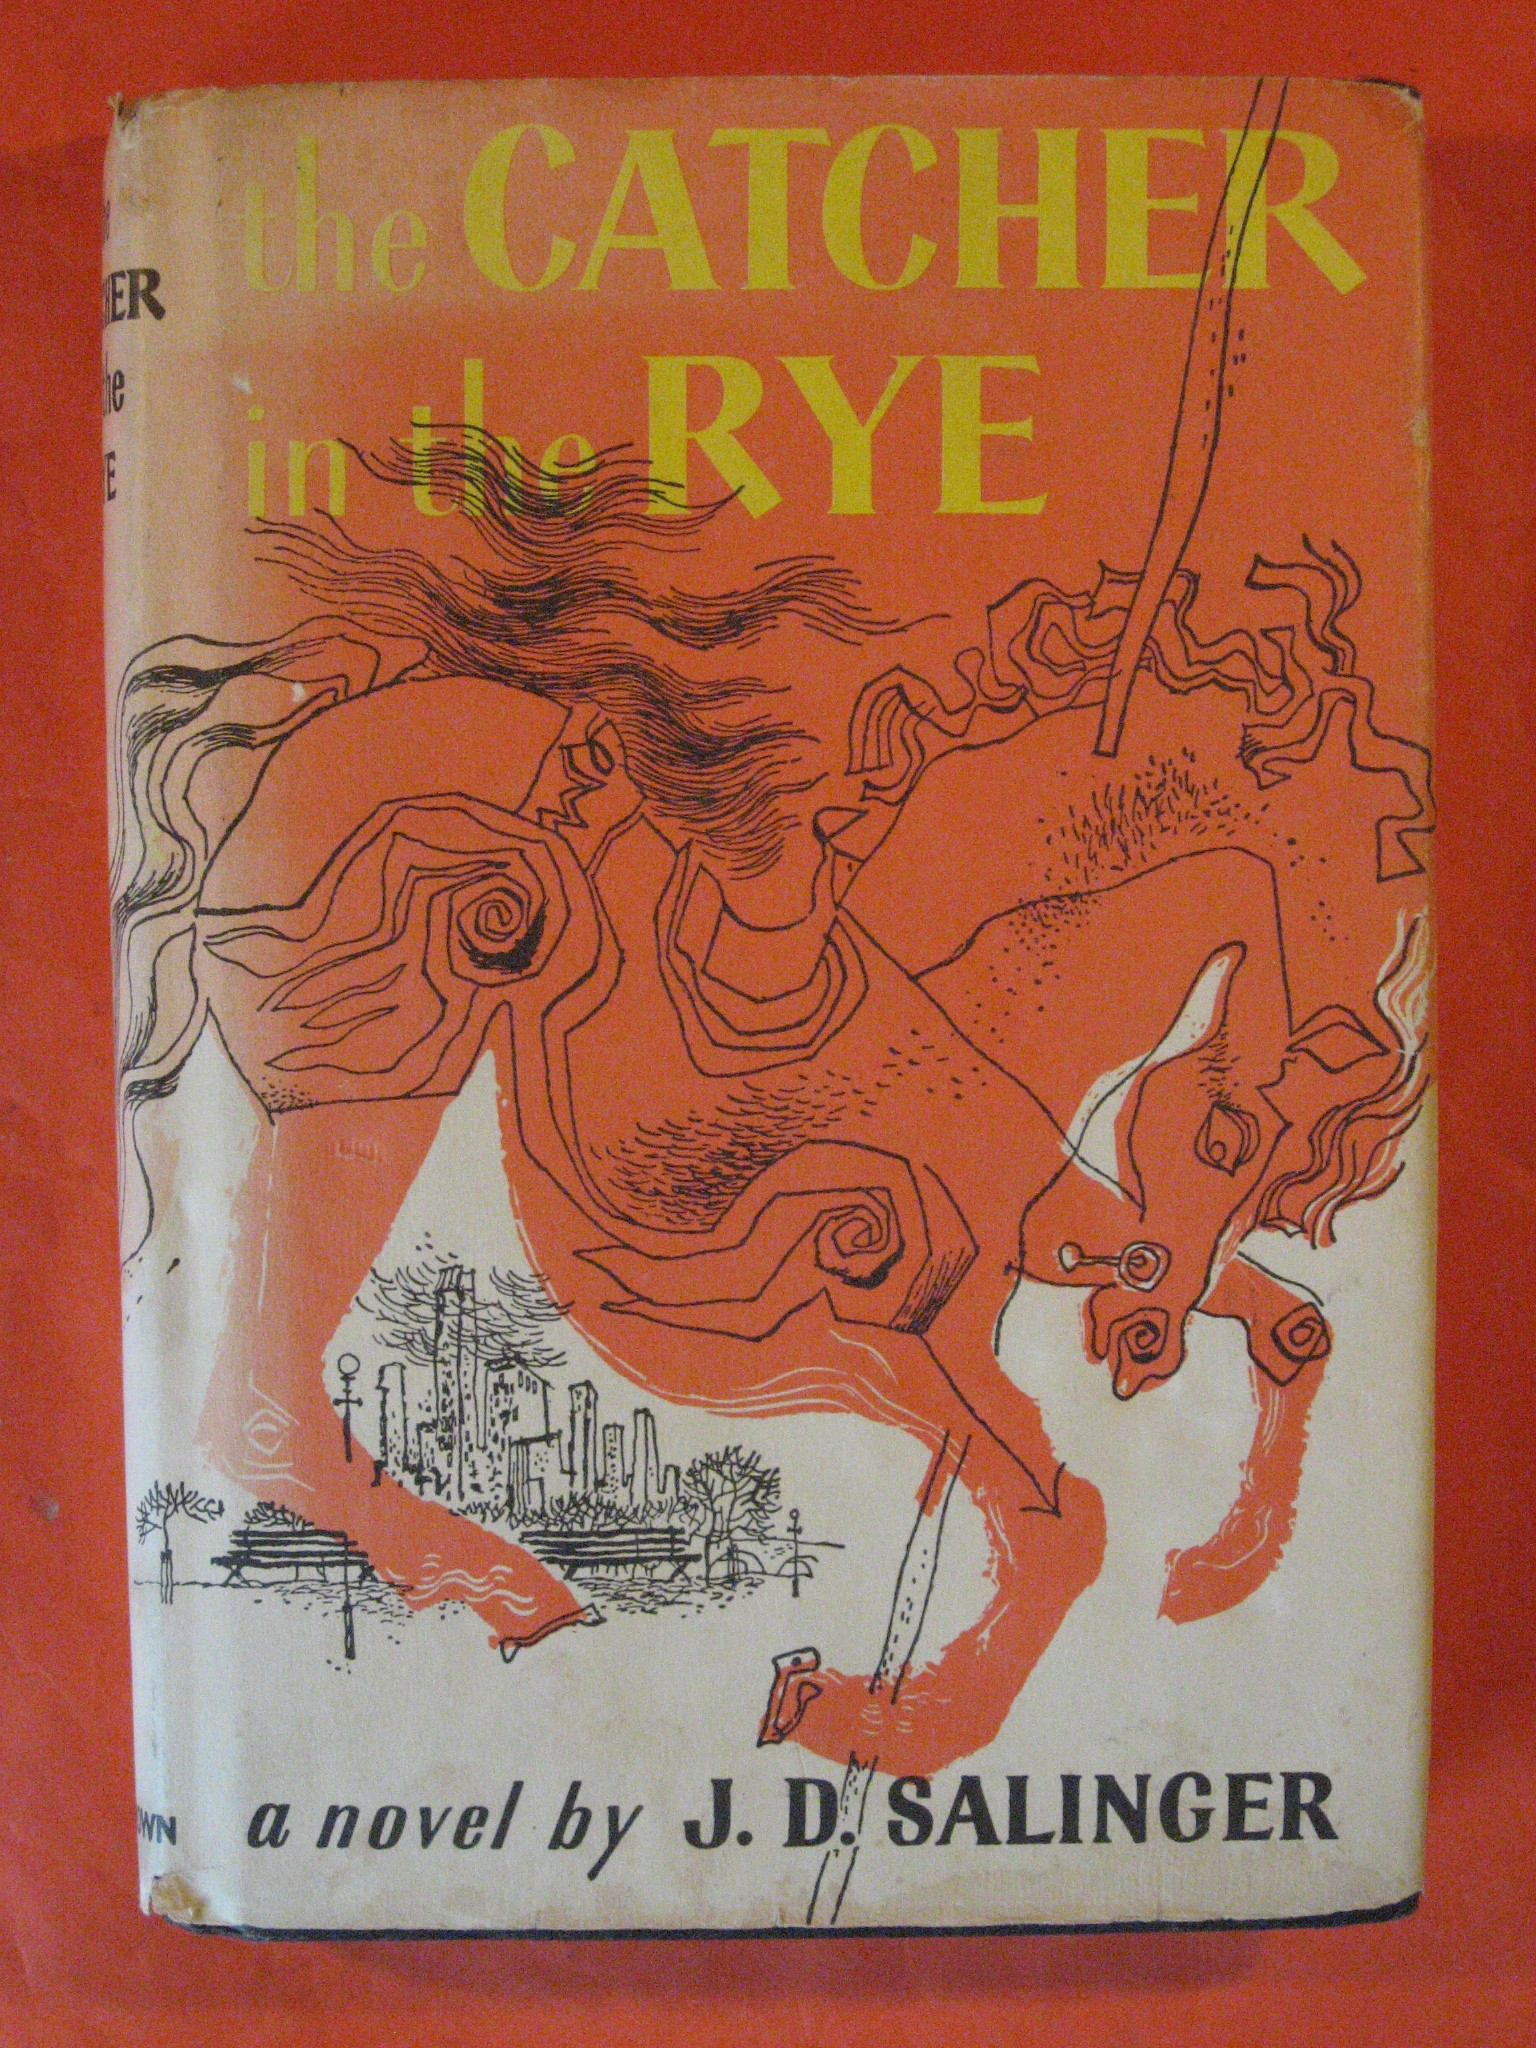 The Catcher in the Rye, Salinger, J. D.